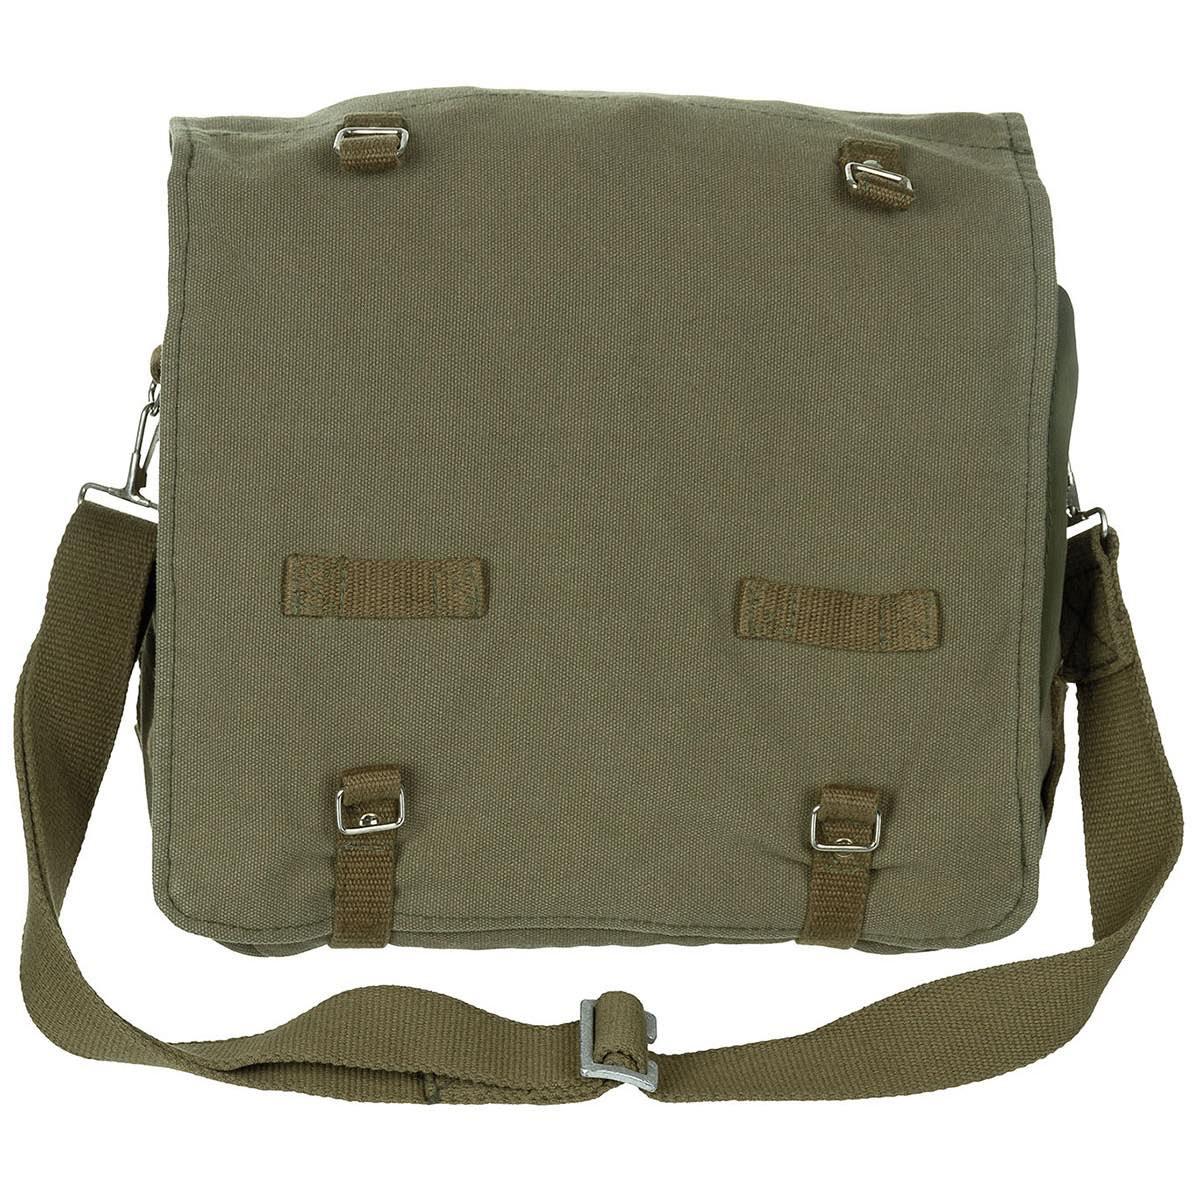 BW Kampftasche groß oliv-stonewashed